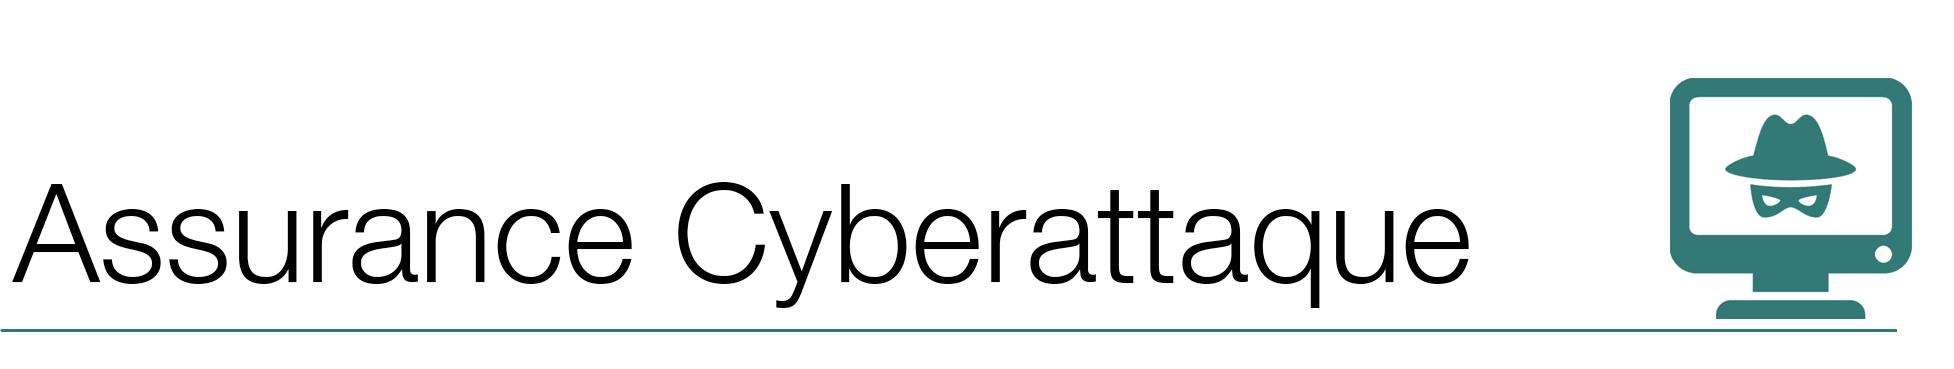 Assurance Cyberattaque